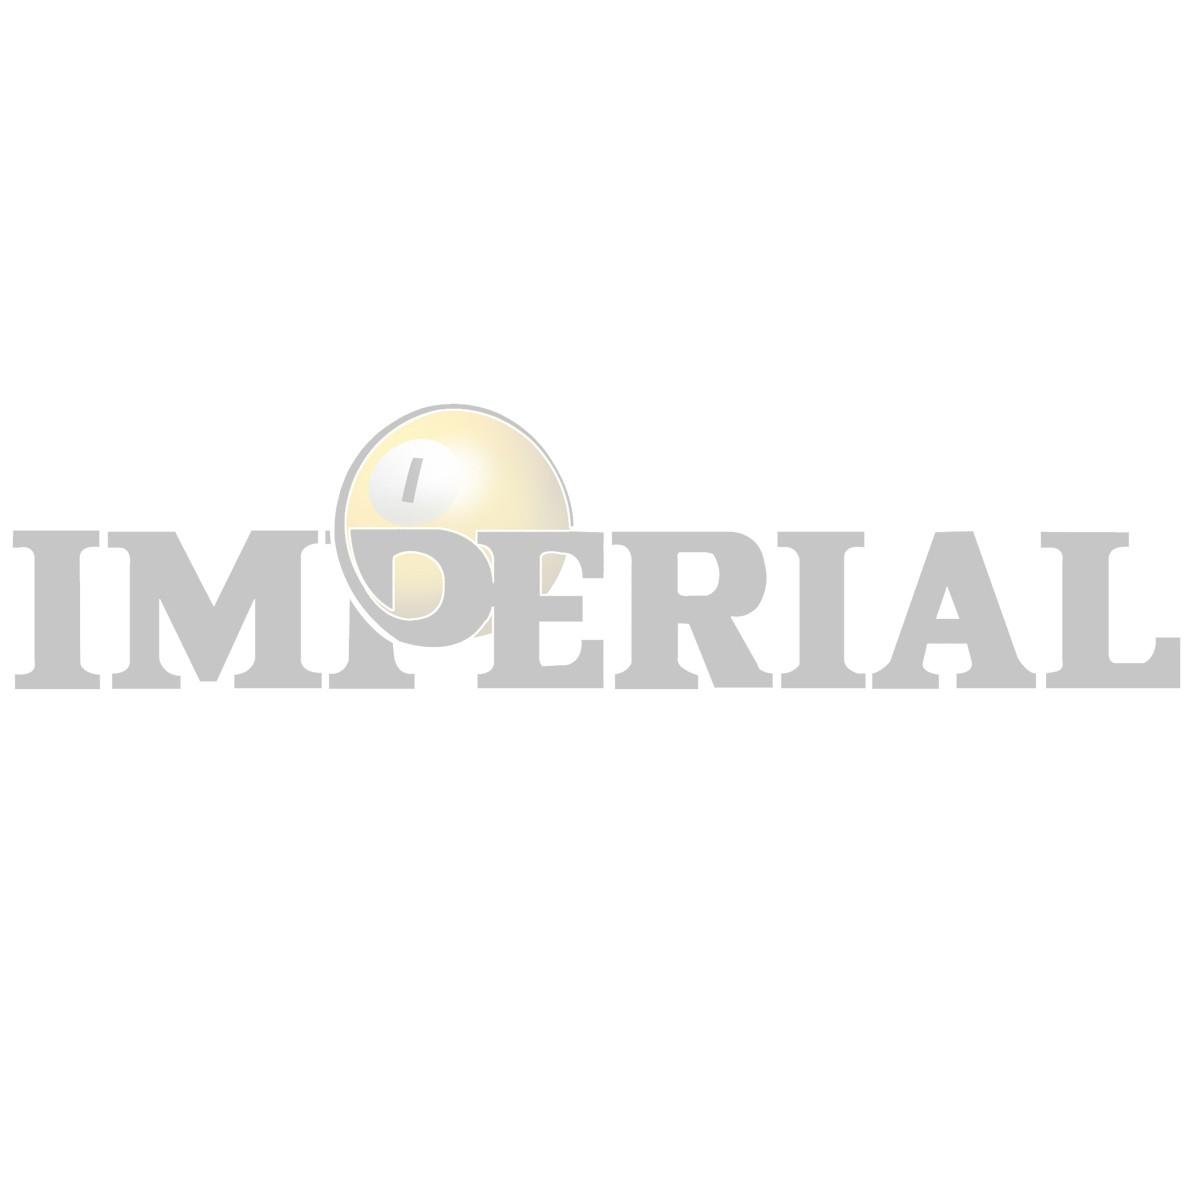 University of Arkansas Home vs. Away Billiard Ball Set